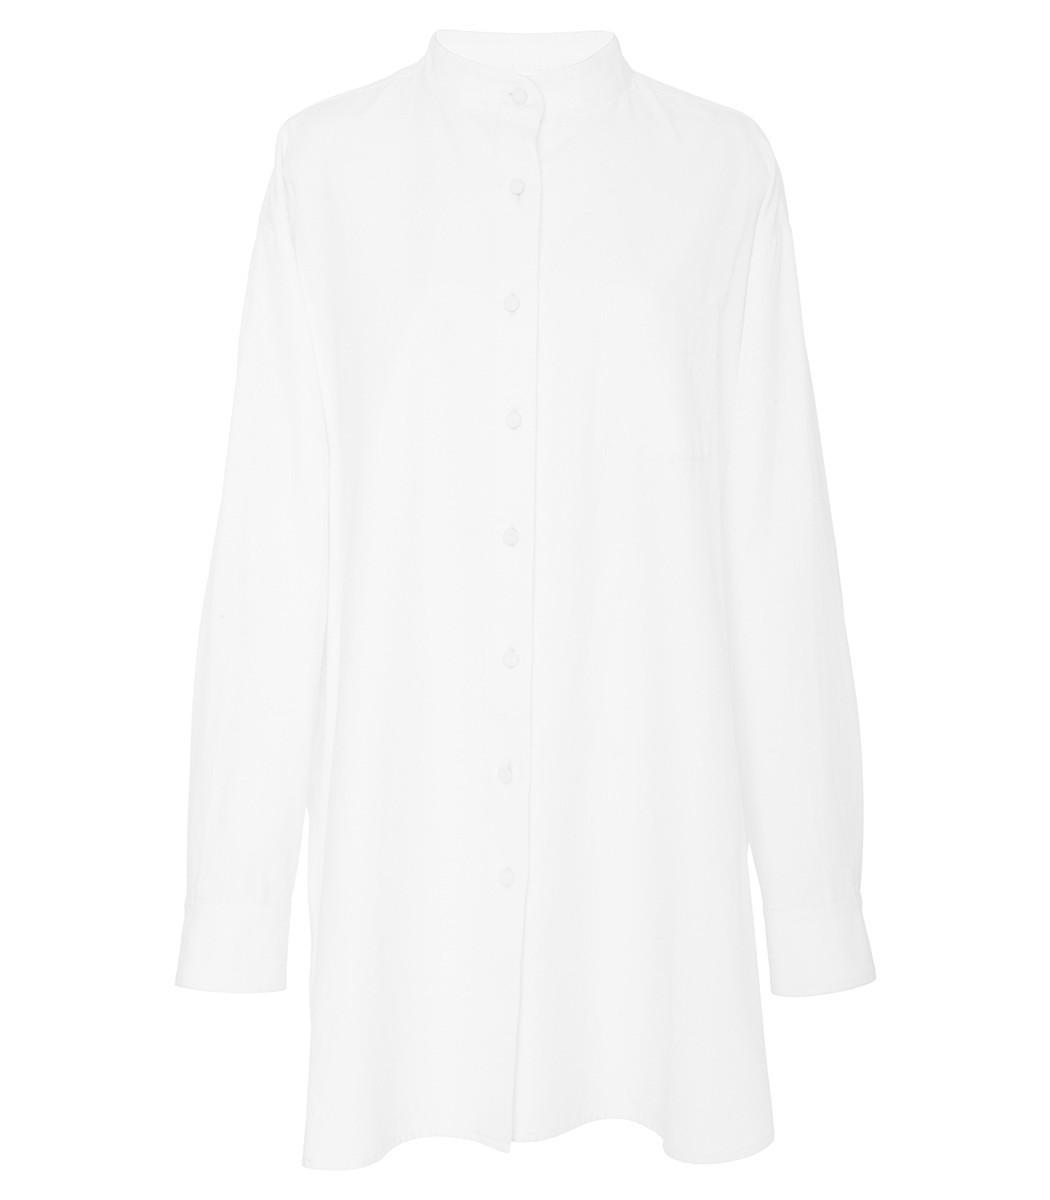 MARISA WITKIN Oxford Dress Shirt